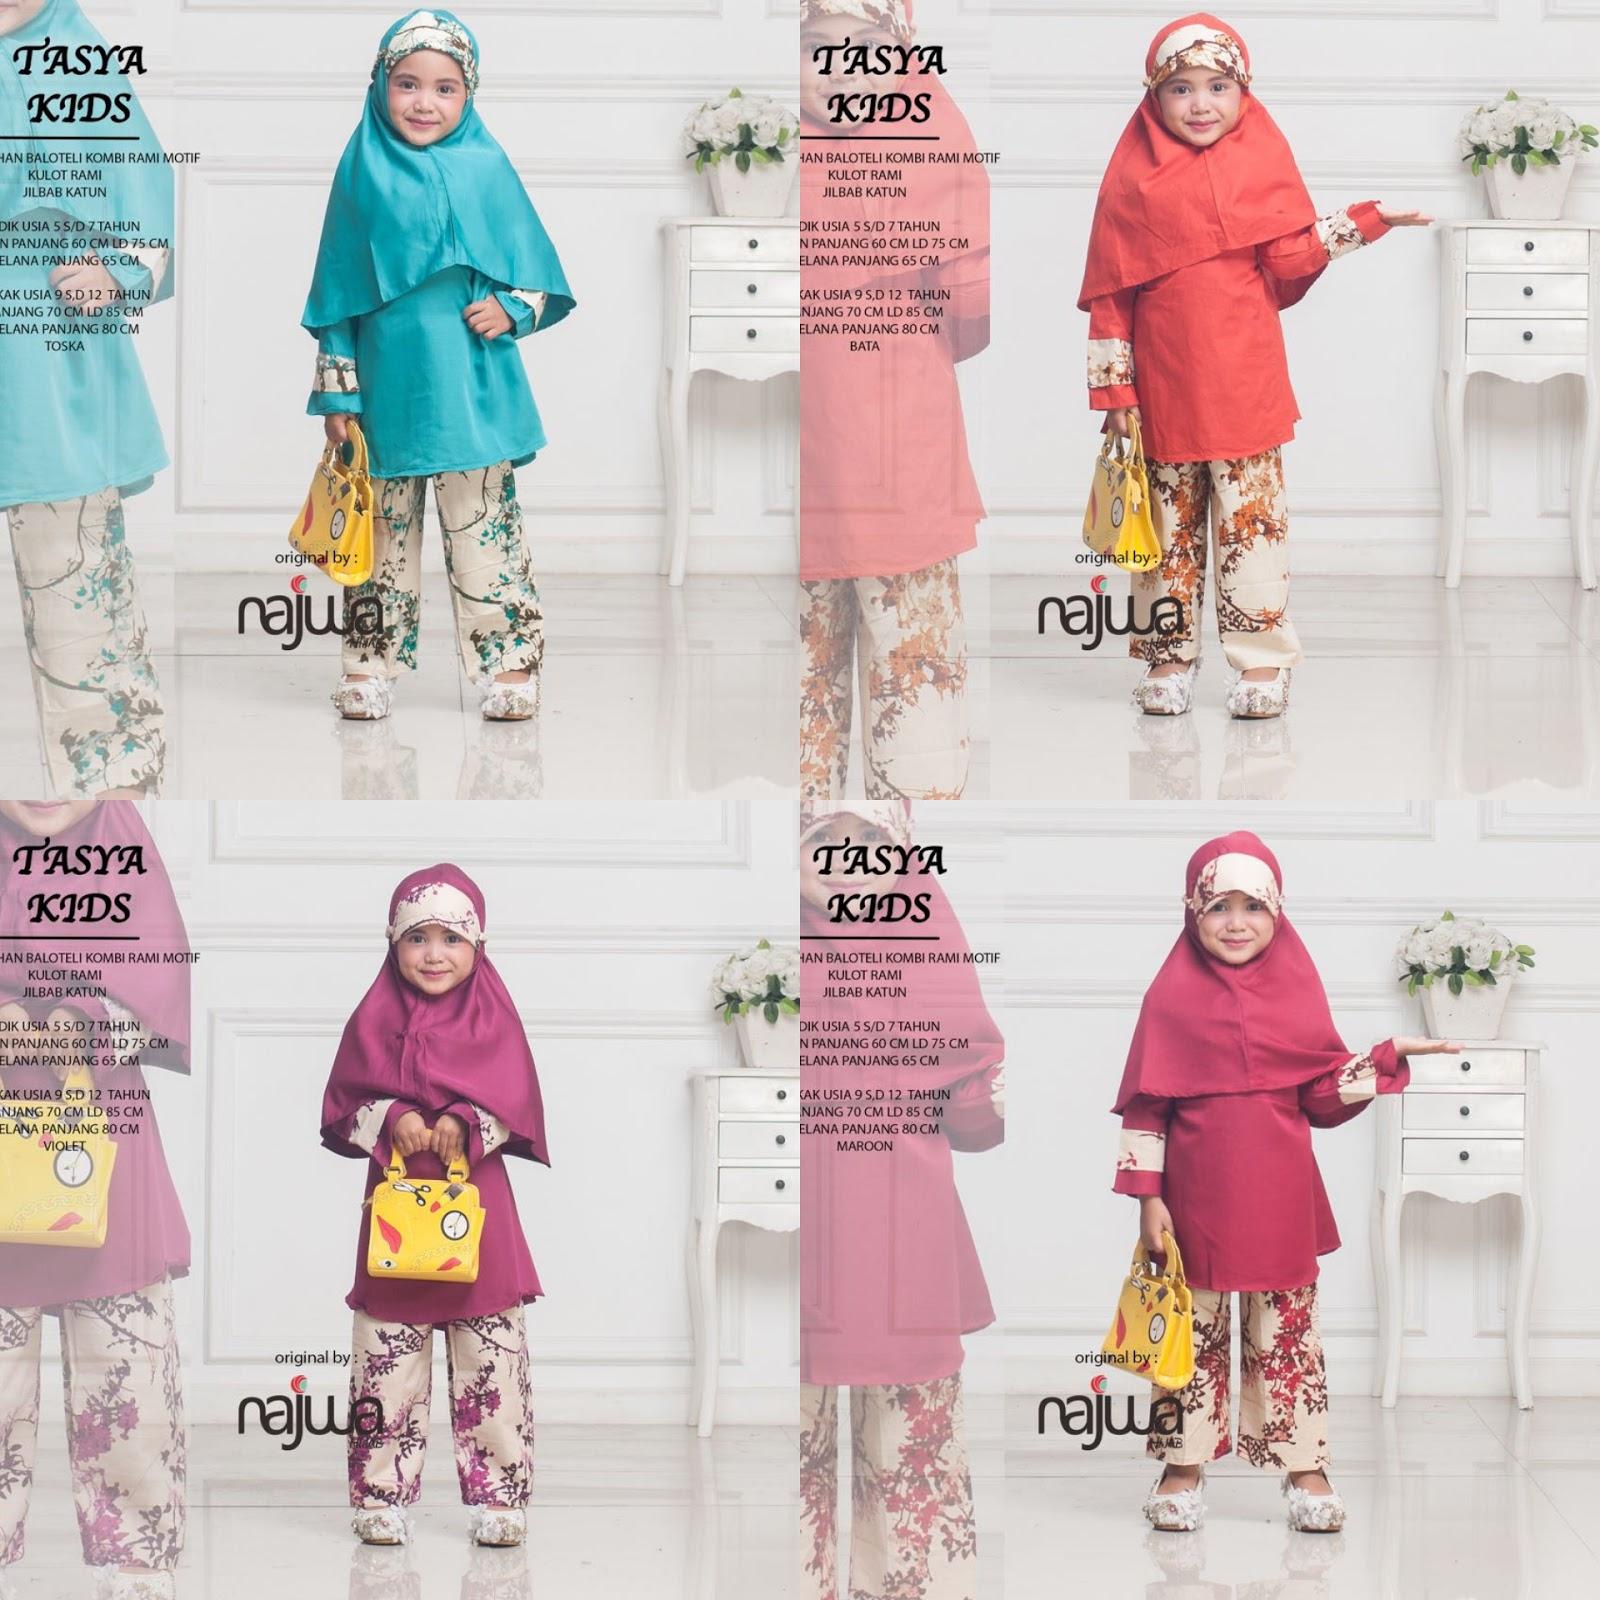 Andieen Shopping May 2018 Tas Import Ohanel Gratis Hijab Instan Najwa Tasya Kids By